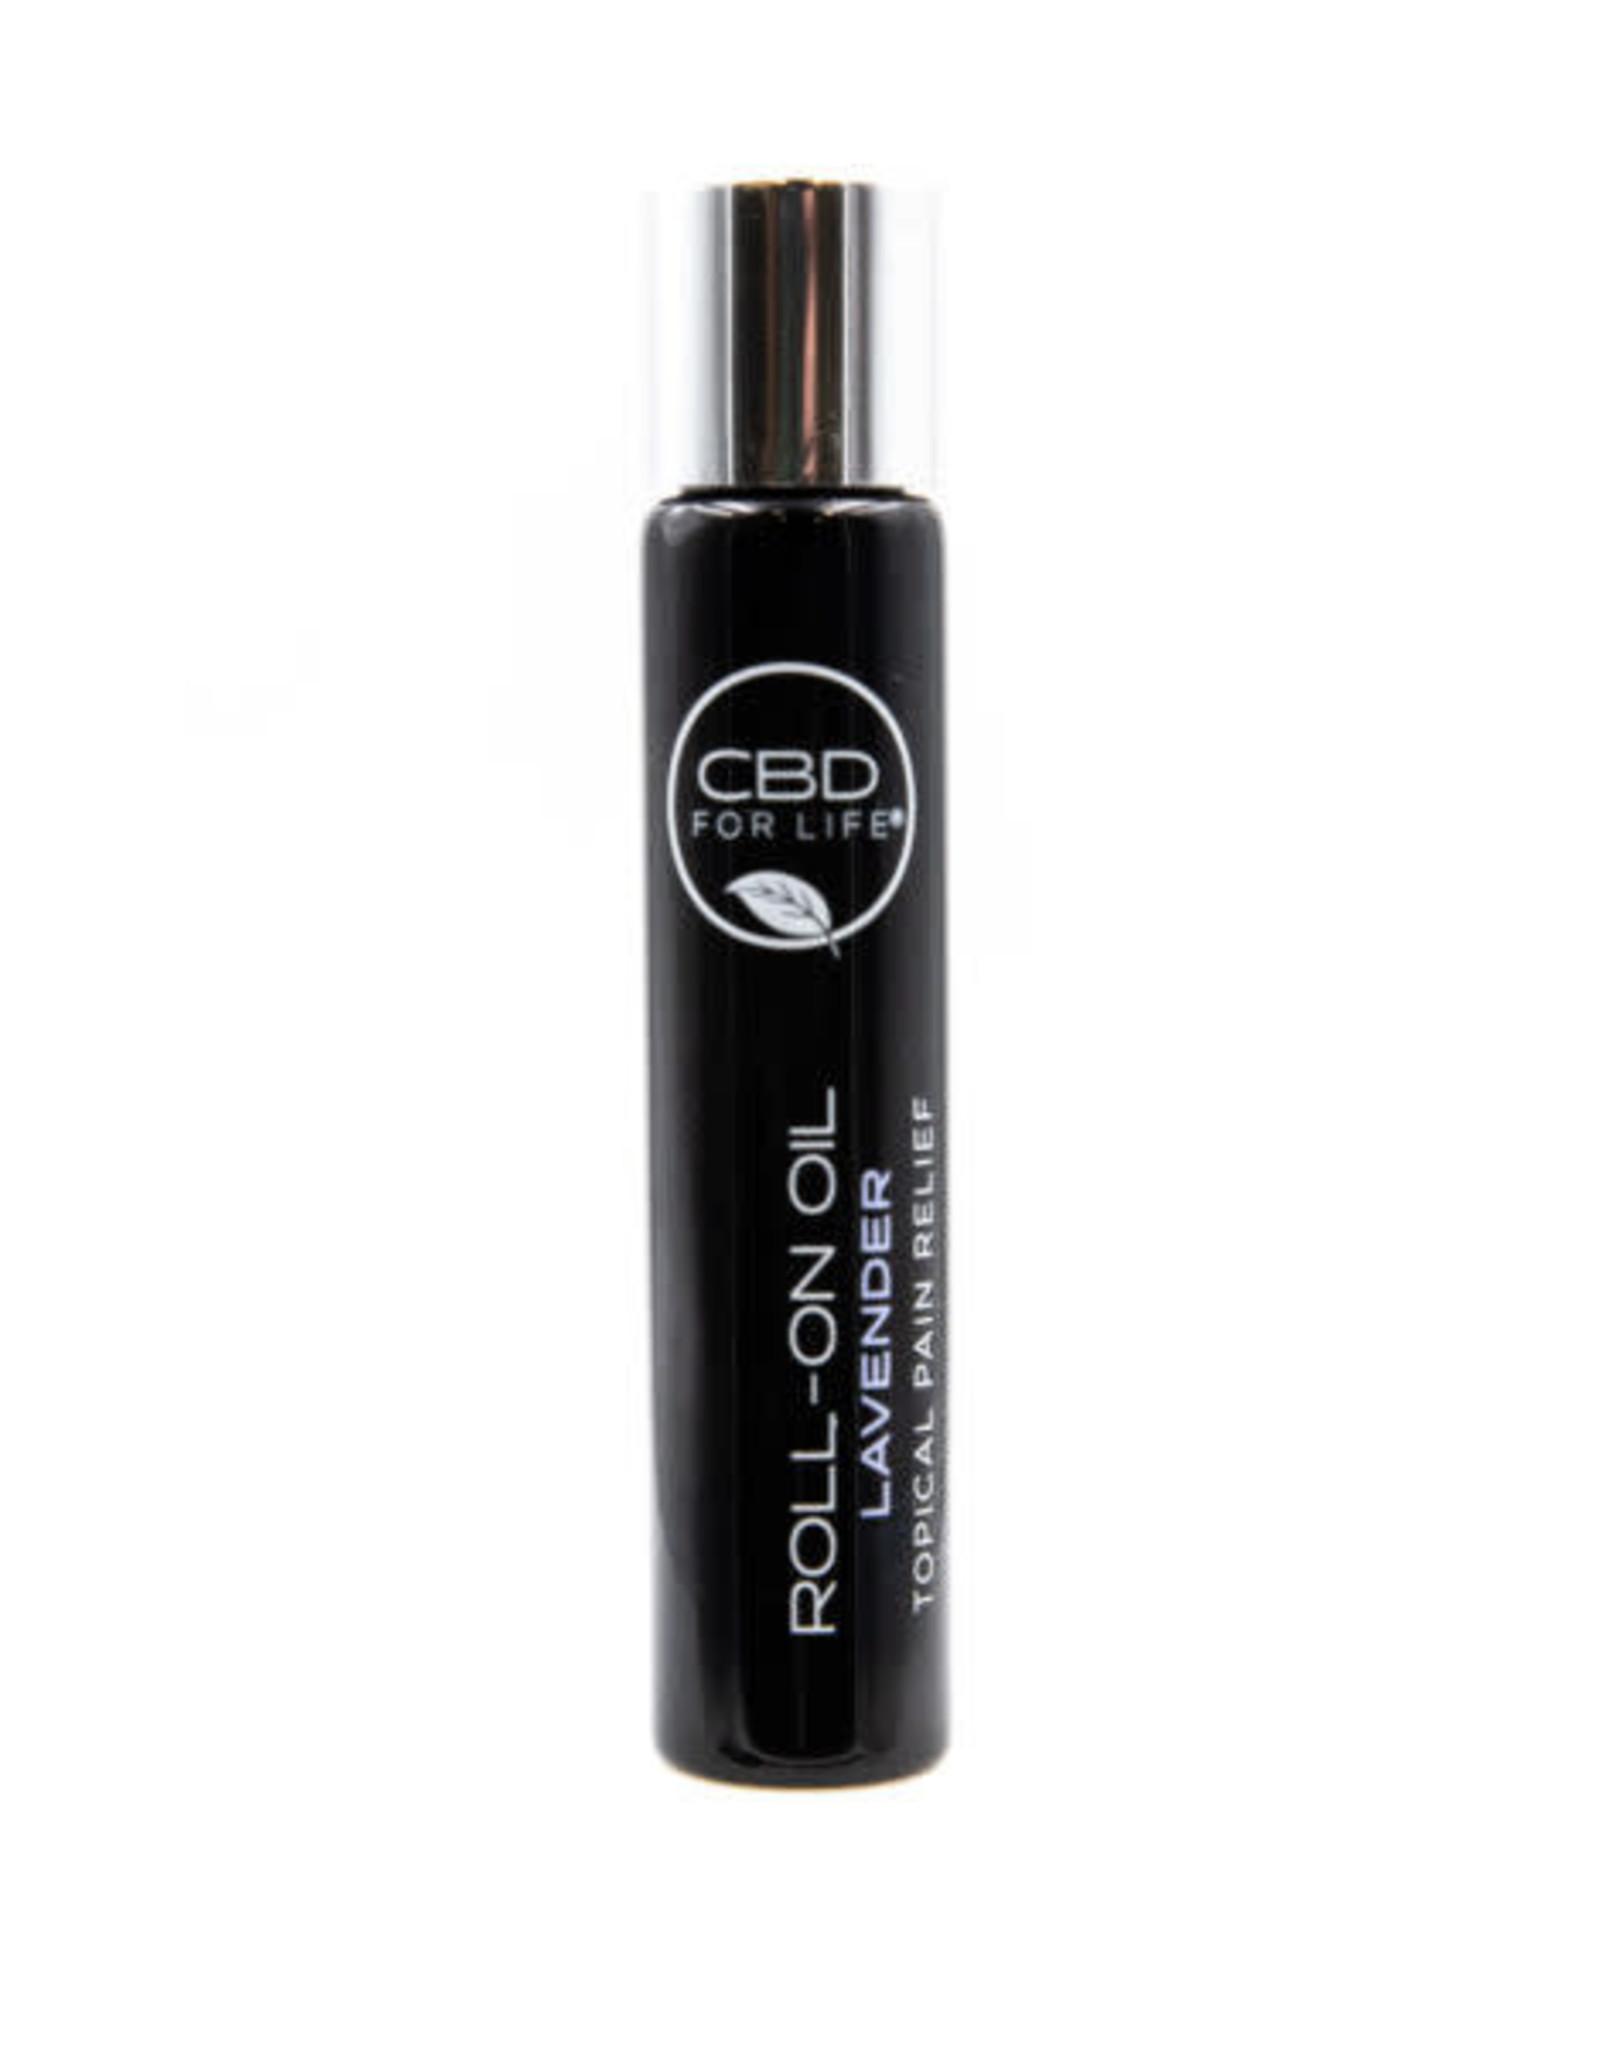 CBD For Life Roll-On CBD Oil Lavender Pain Cream